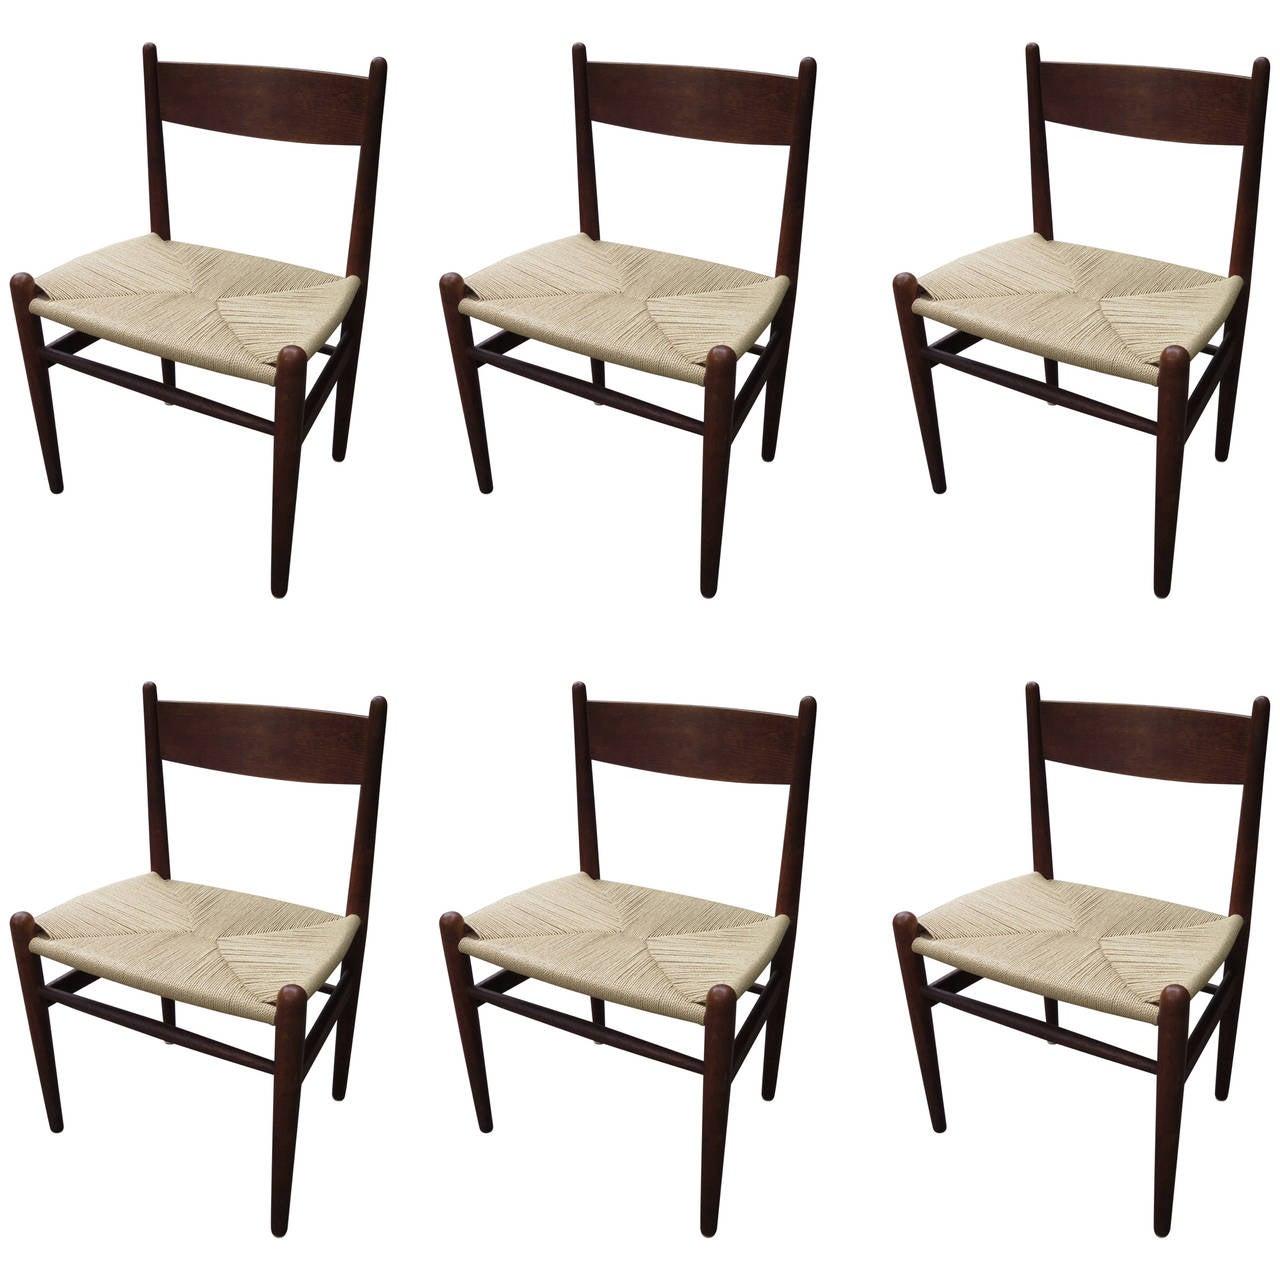 Gorgeous hans wegner set of 6 dining chairs at 1stdibs for Wegner dining chair